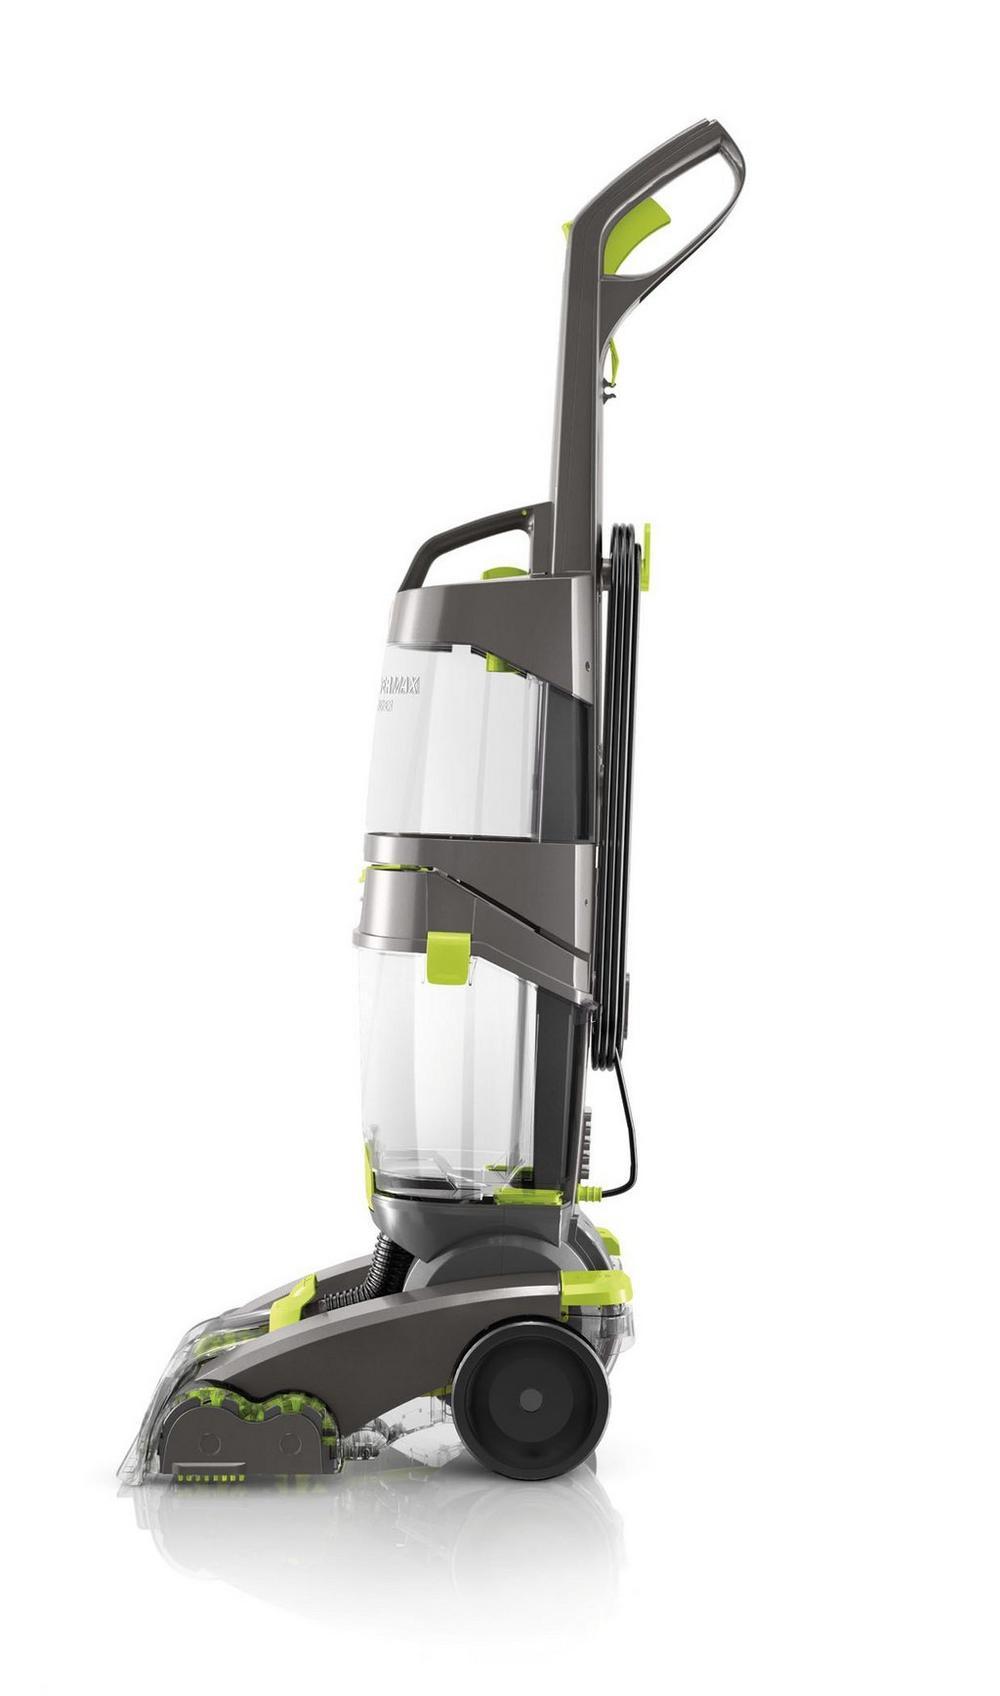 Reconditioned Dual PowerMax Carpet Cleaner3